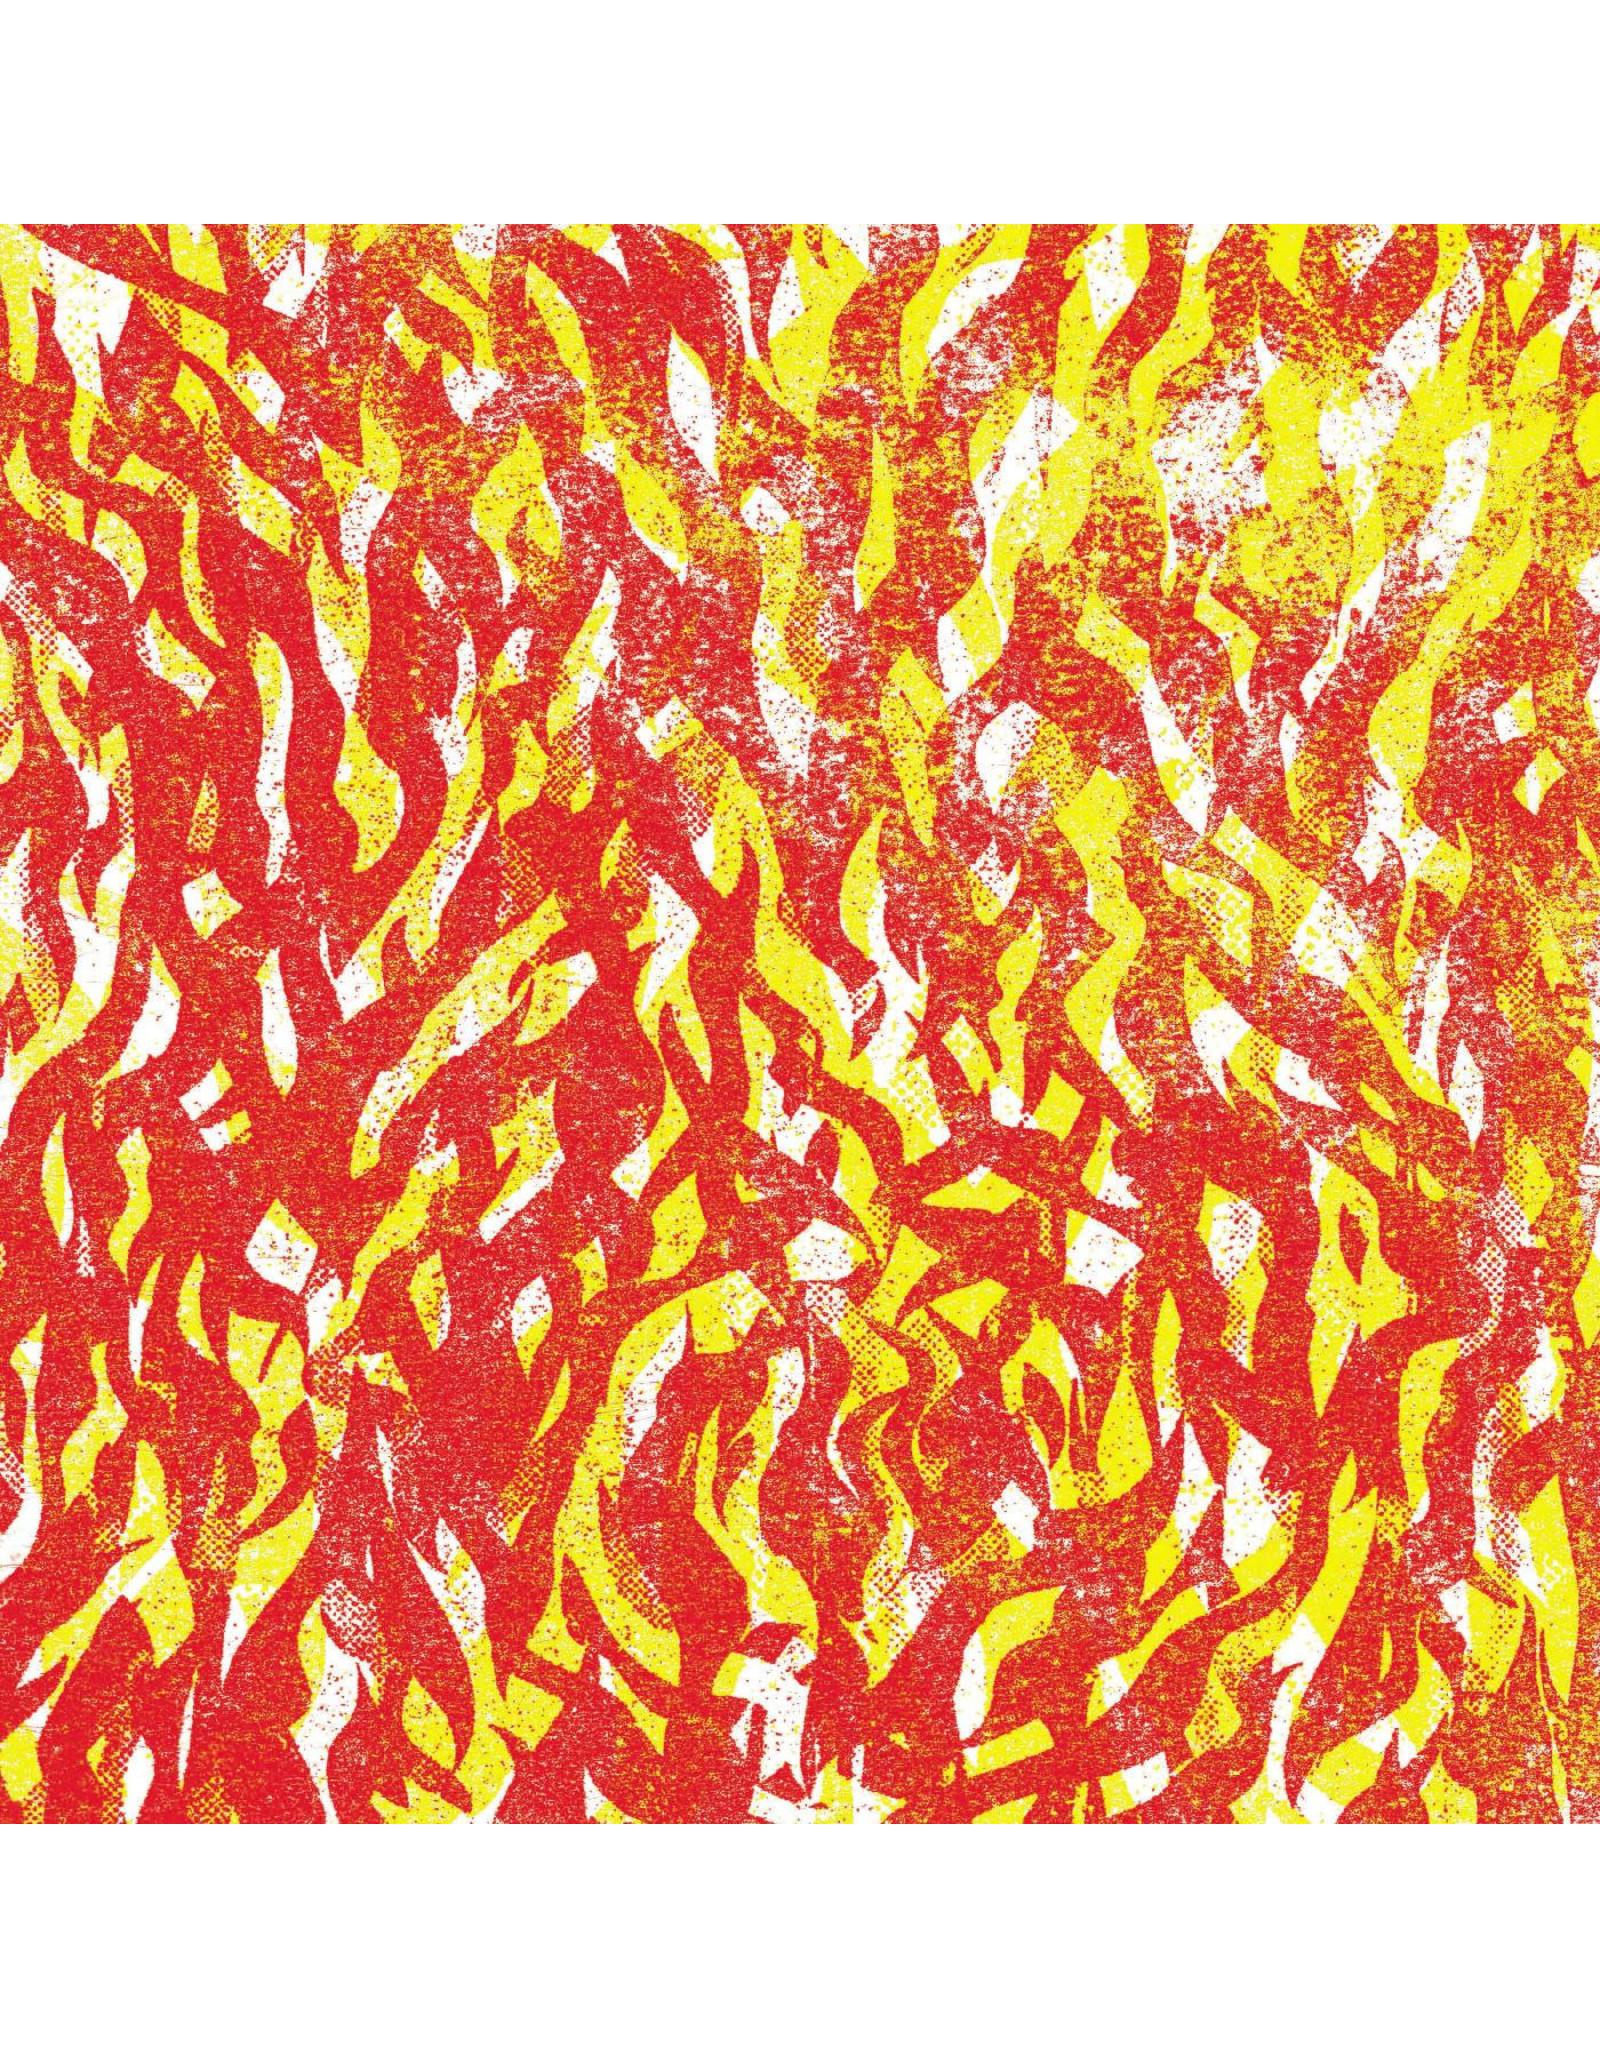 New Vinyl The Bug - FIRE  (Light Gray) 2LP